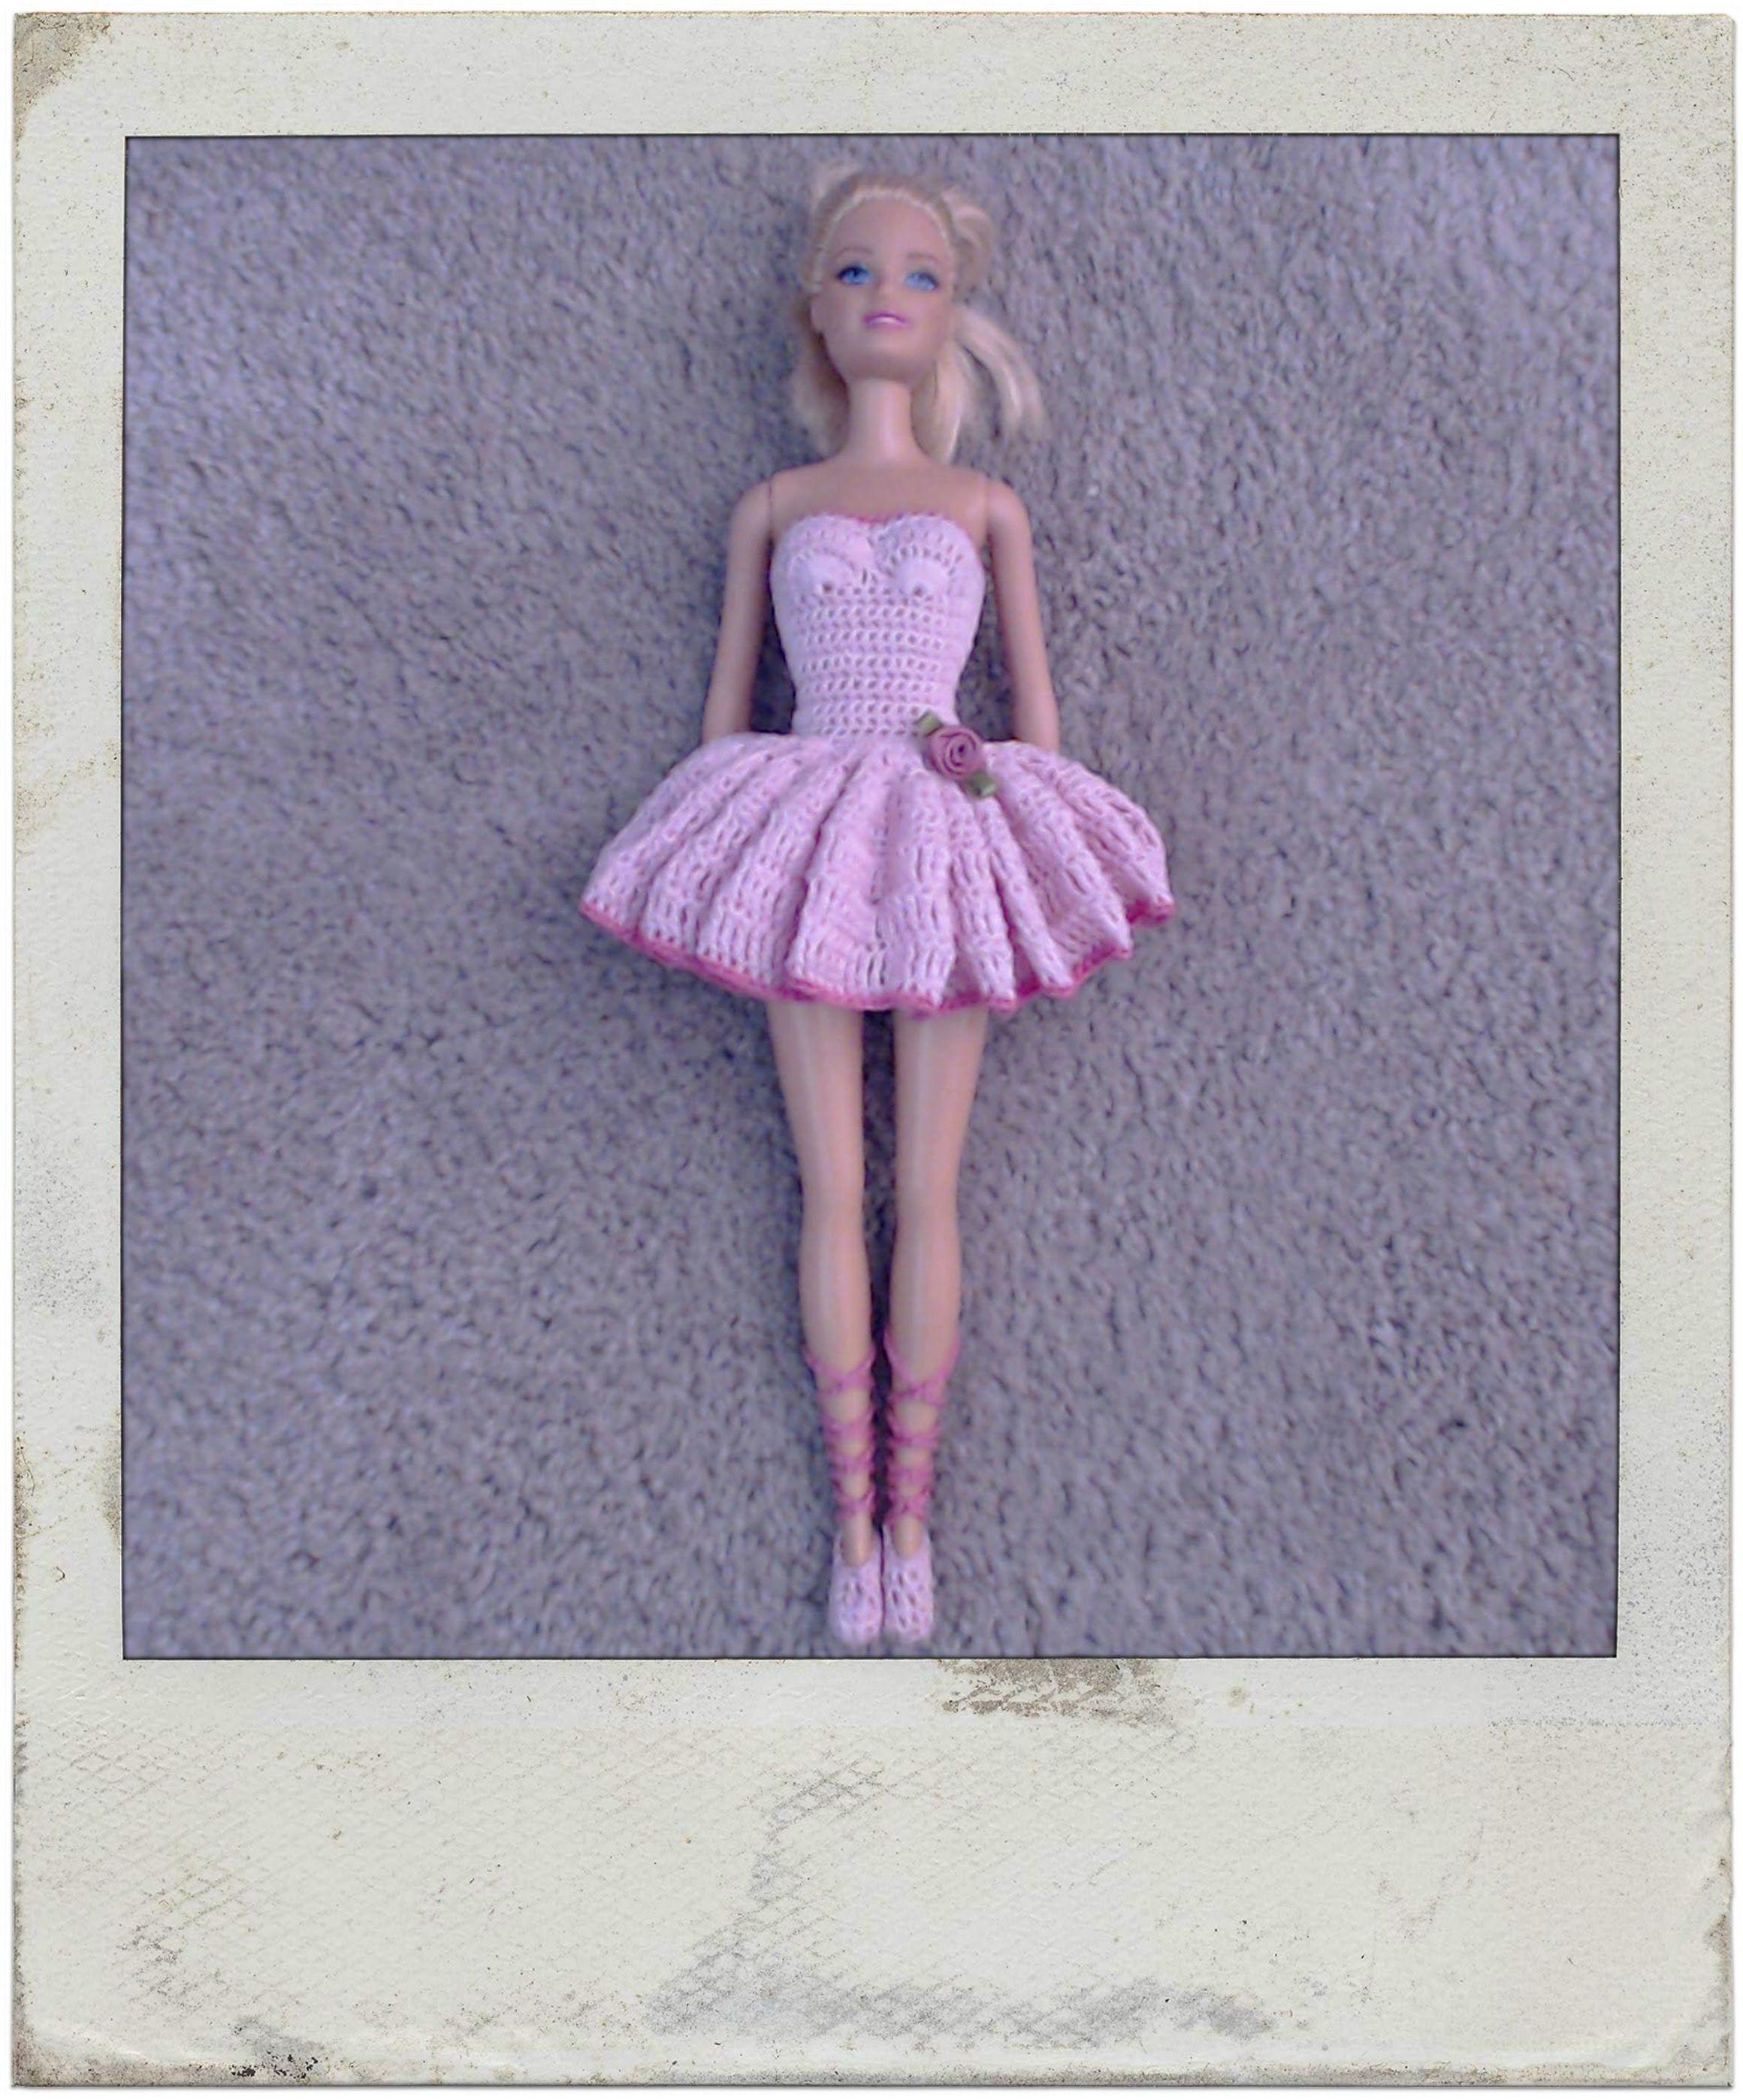 pin the tutu on the ballerina template - crochet barbie 39 s ballerina tutu slippers barbi video